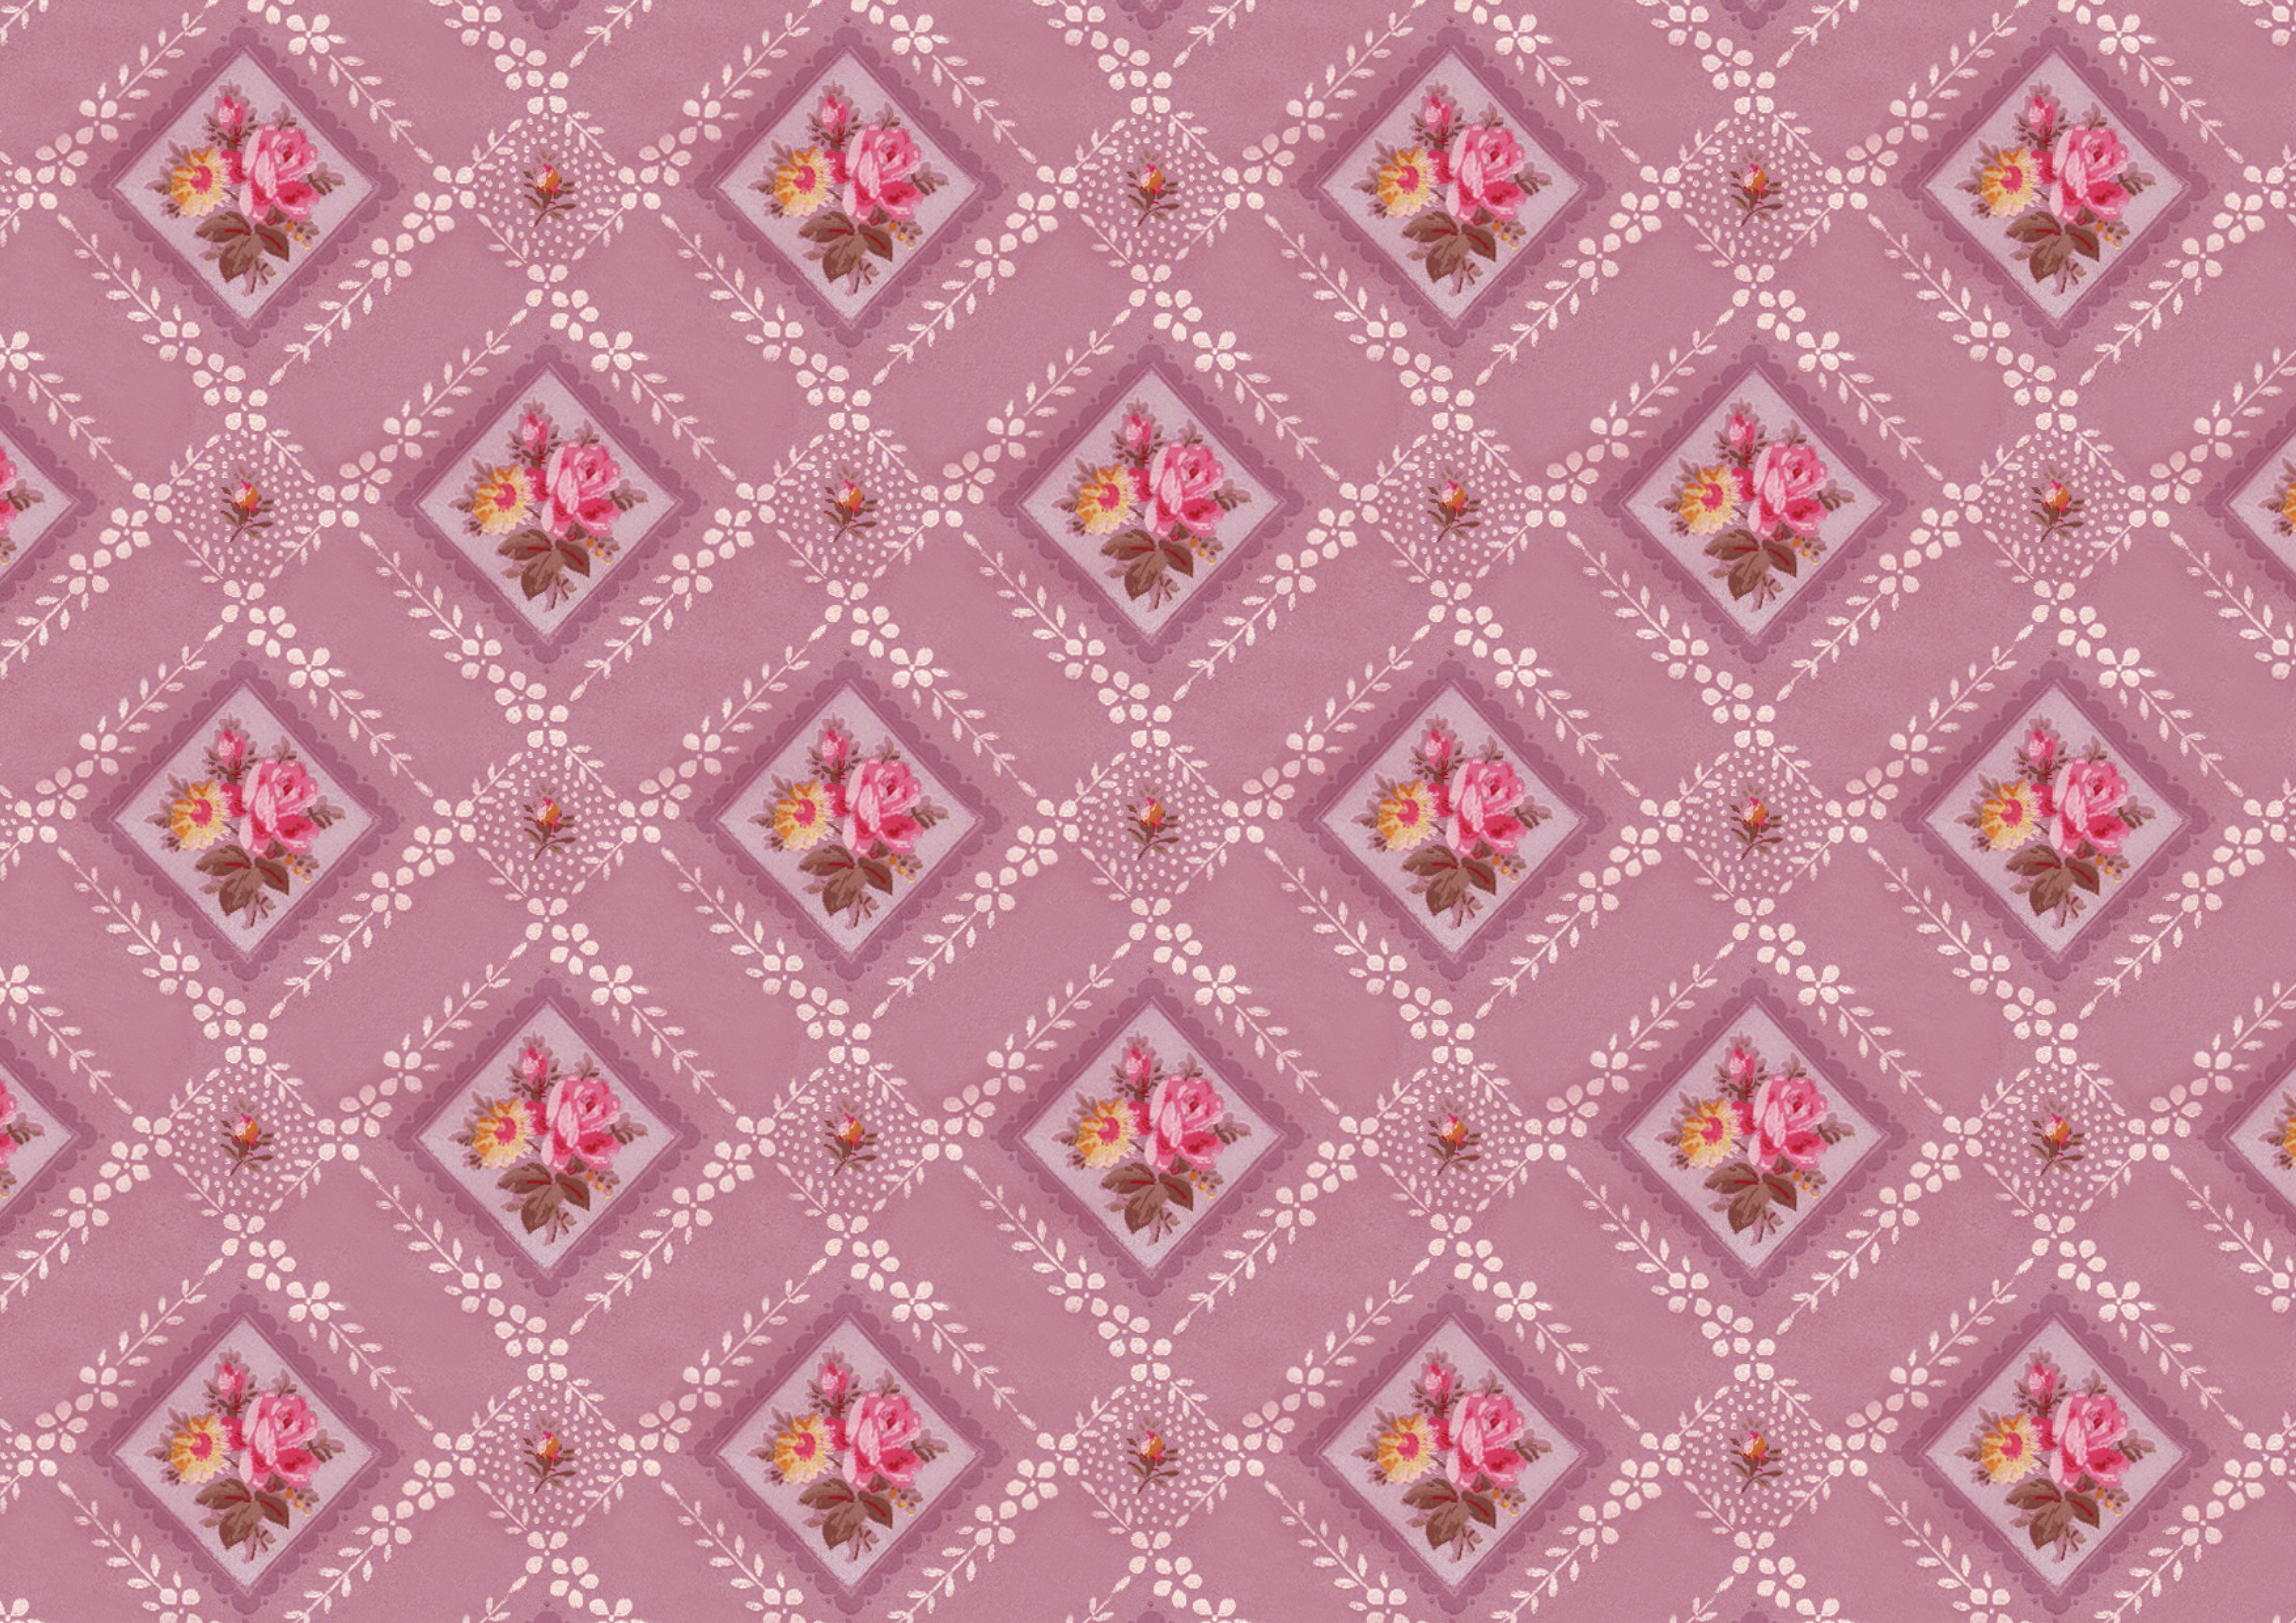 Vintage Floral Wallpaper Pattern And Printable Paper – Wings Of Whimsy - Free Printable Wallpaper Patterns